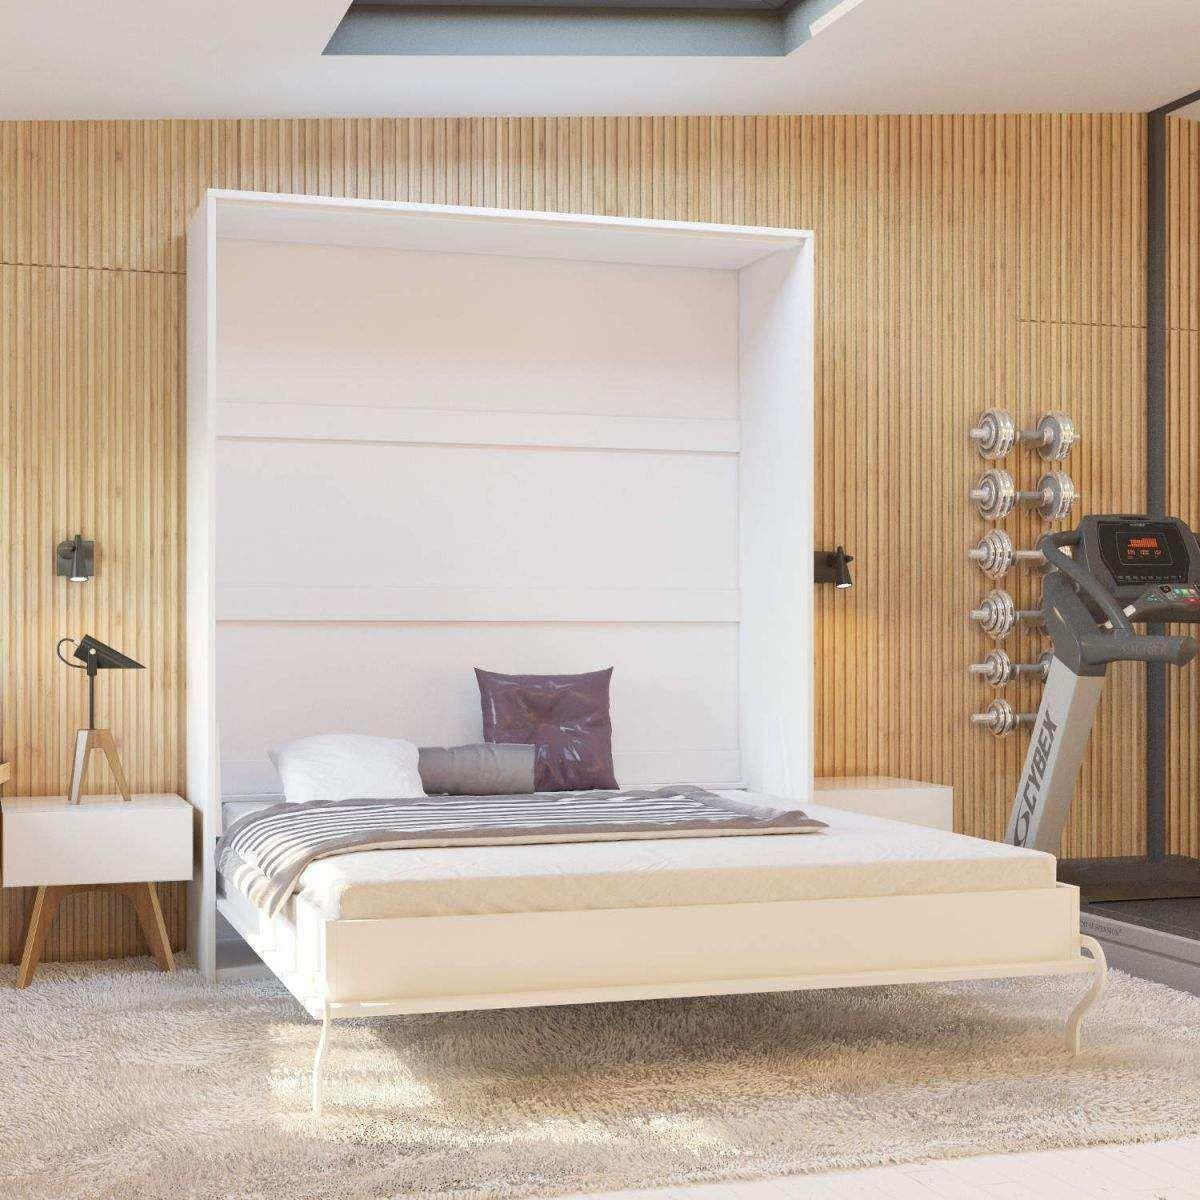 Full Size of Schrankbett 180x200 Ikea Wandbett Watersoftnerguide Smart Bett Modernes Bettkasten Amazon Betten Mit 160x200 Massivholz Modulküche Günstig Kaufen Lattenrost Wohnzimmer Schrankbett 180x200 Ikea